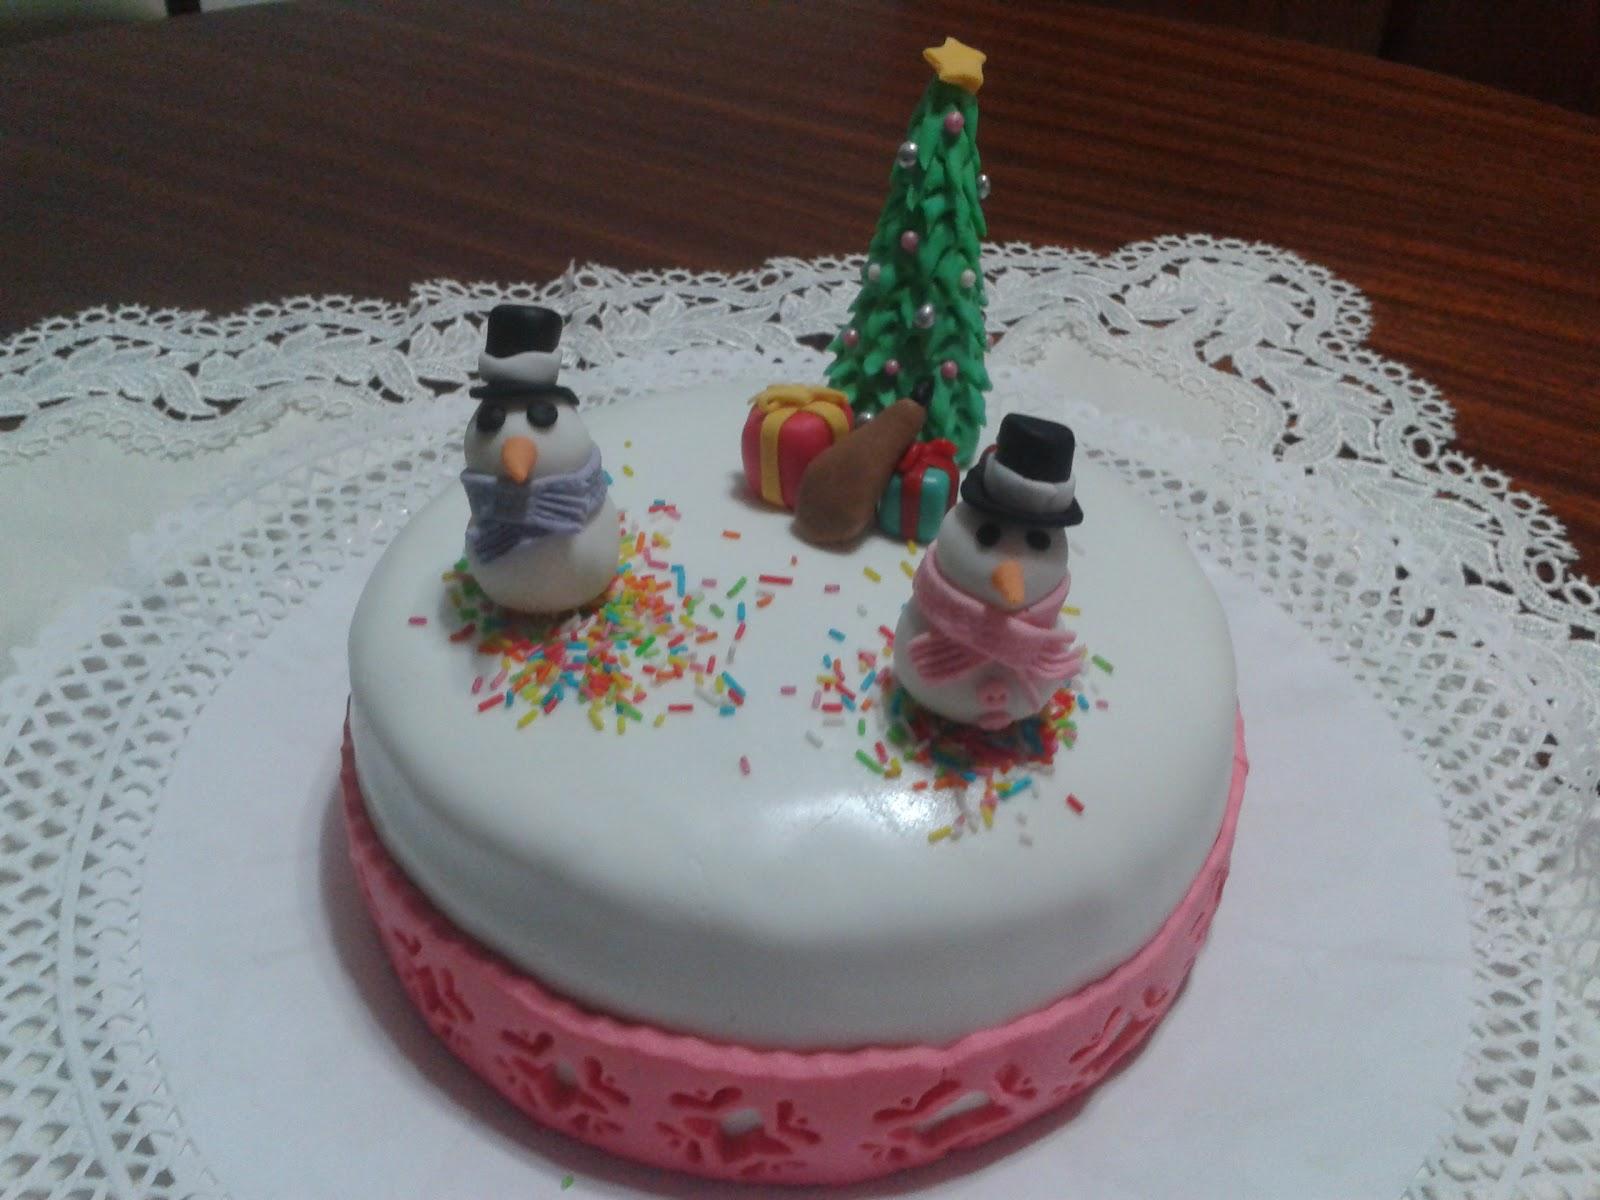 Cupcakes tenerife creaciones navide as - Cupcakes tenerife ...